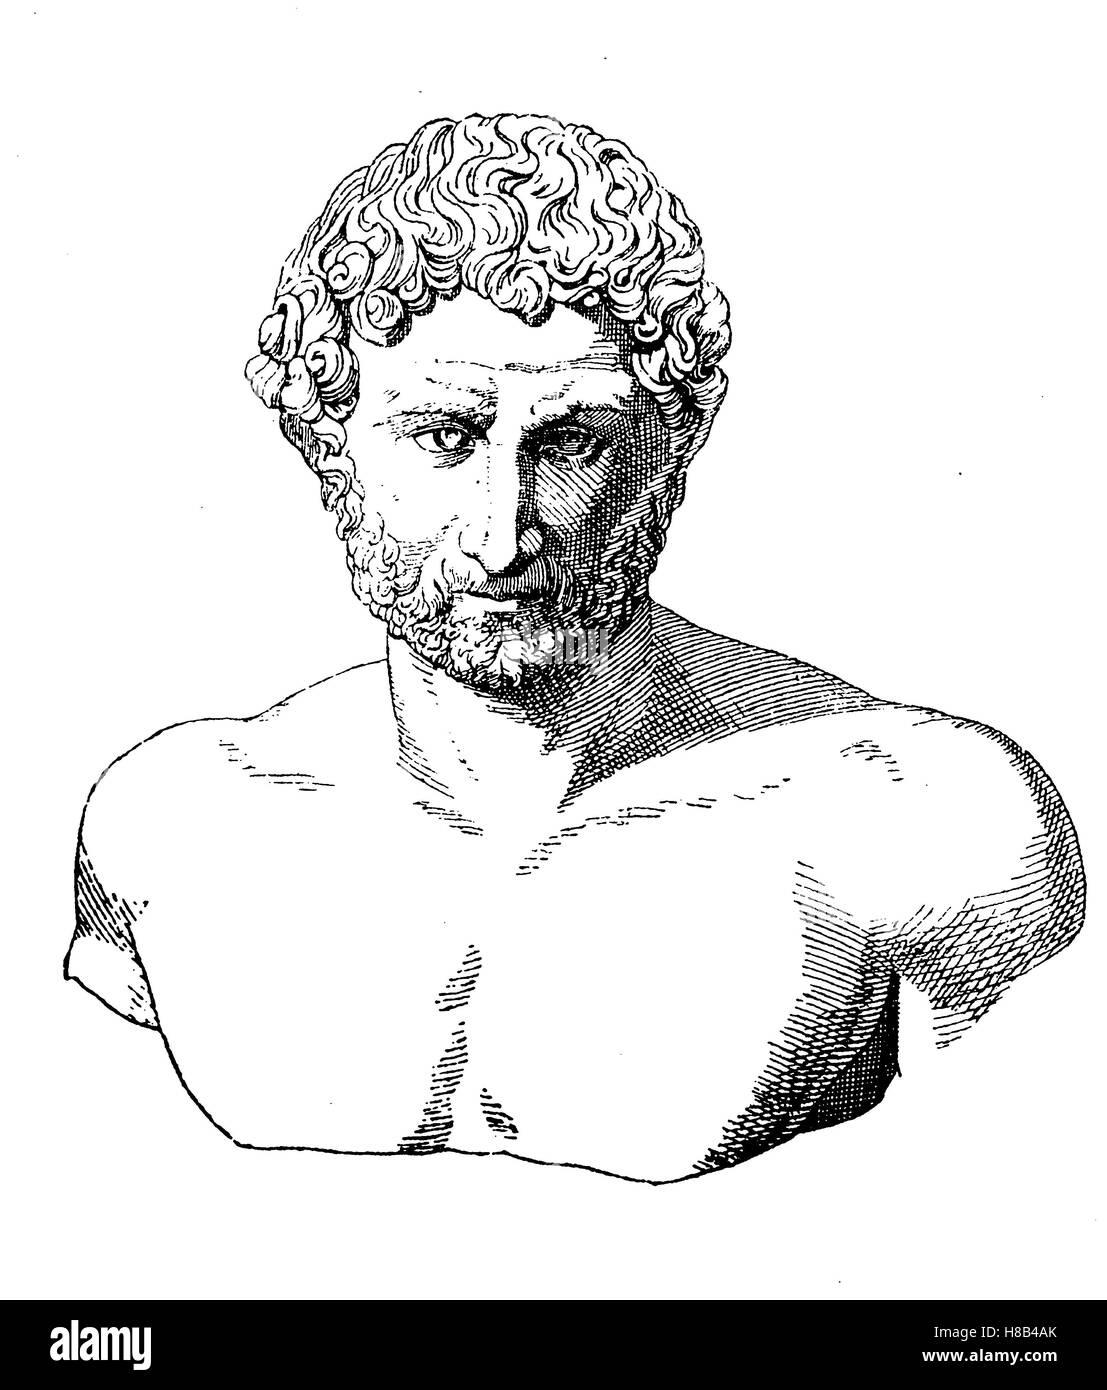 The Roman Emperor Hadrian, History of fashion, costume story - Stock Image